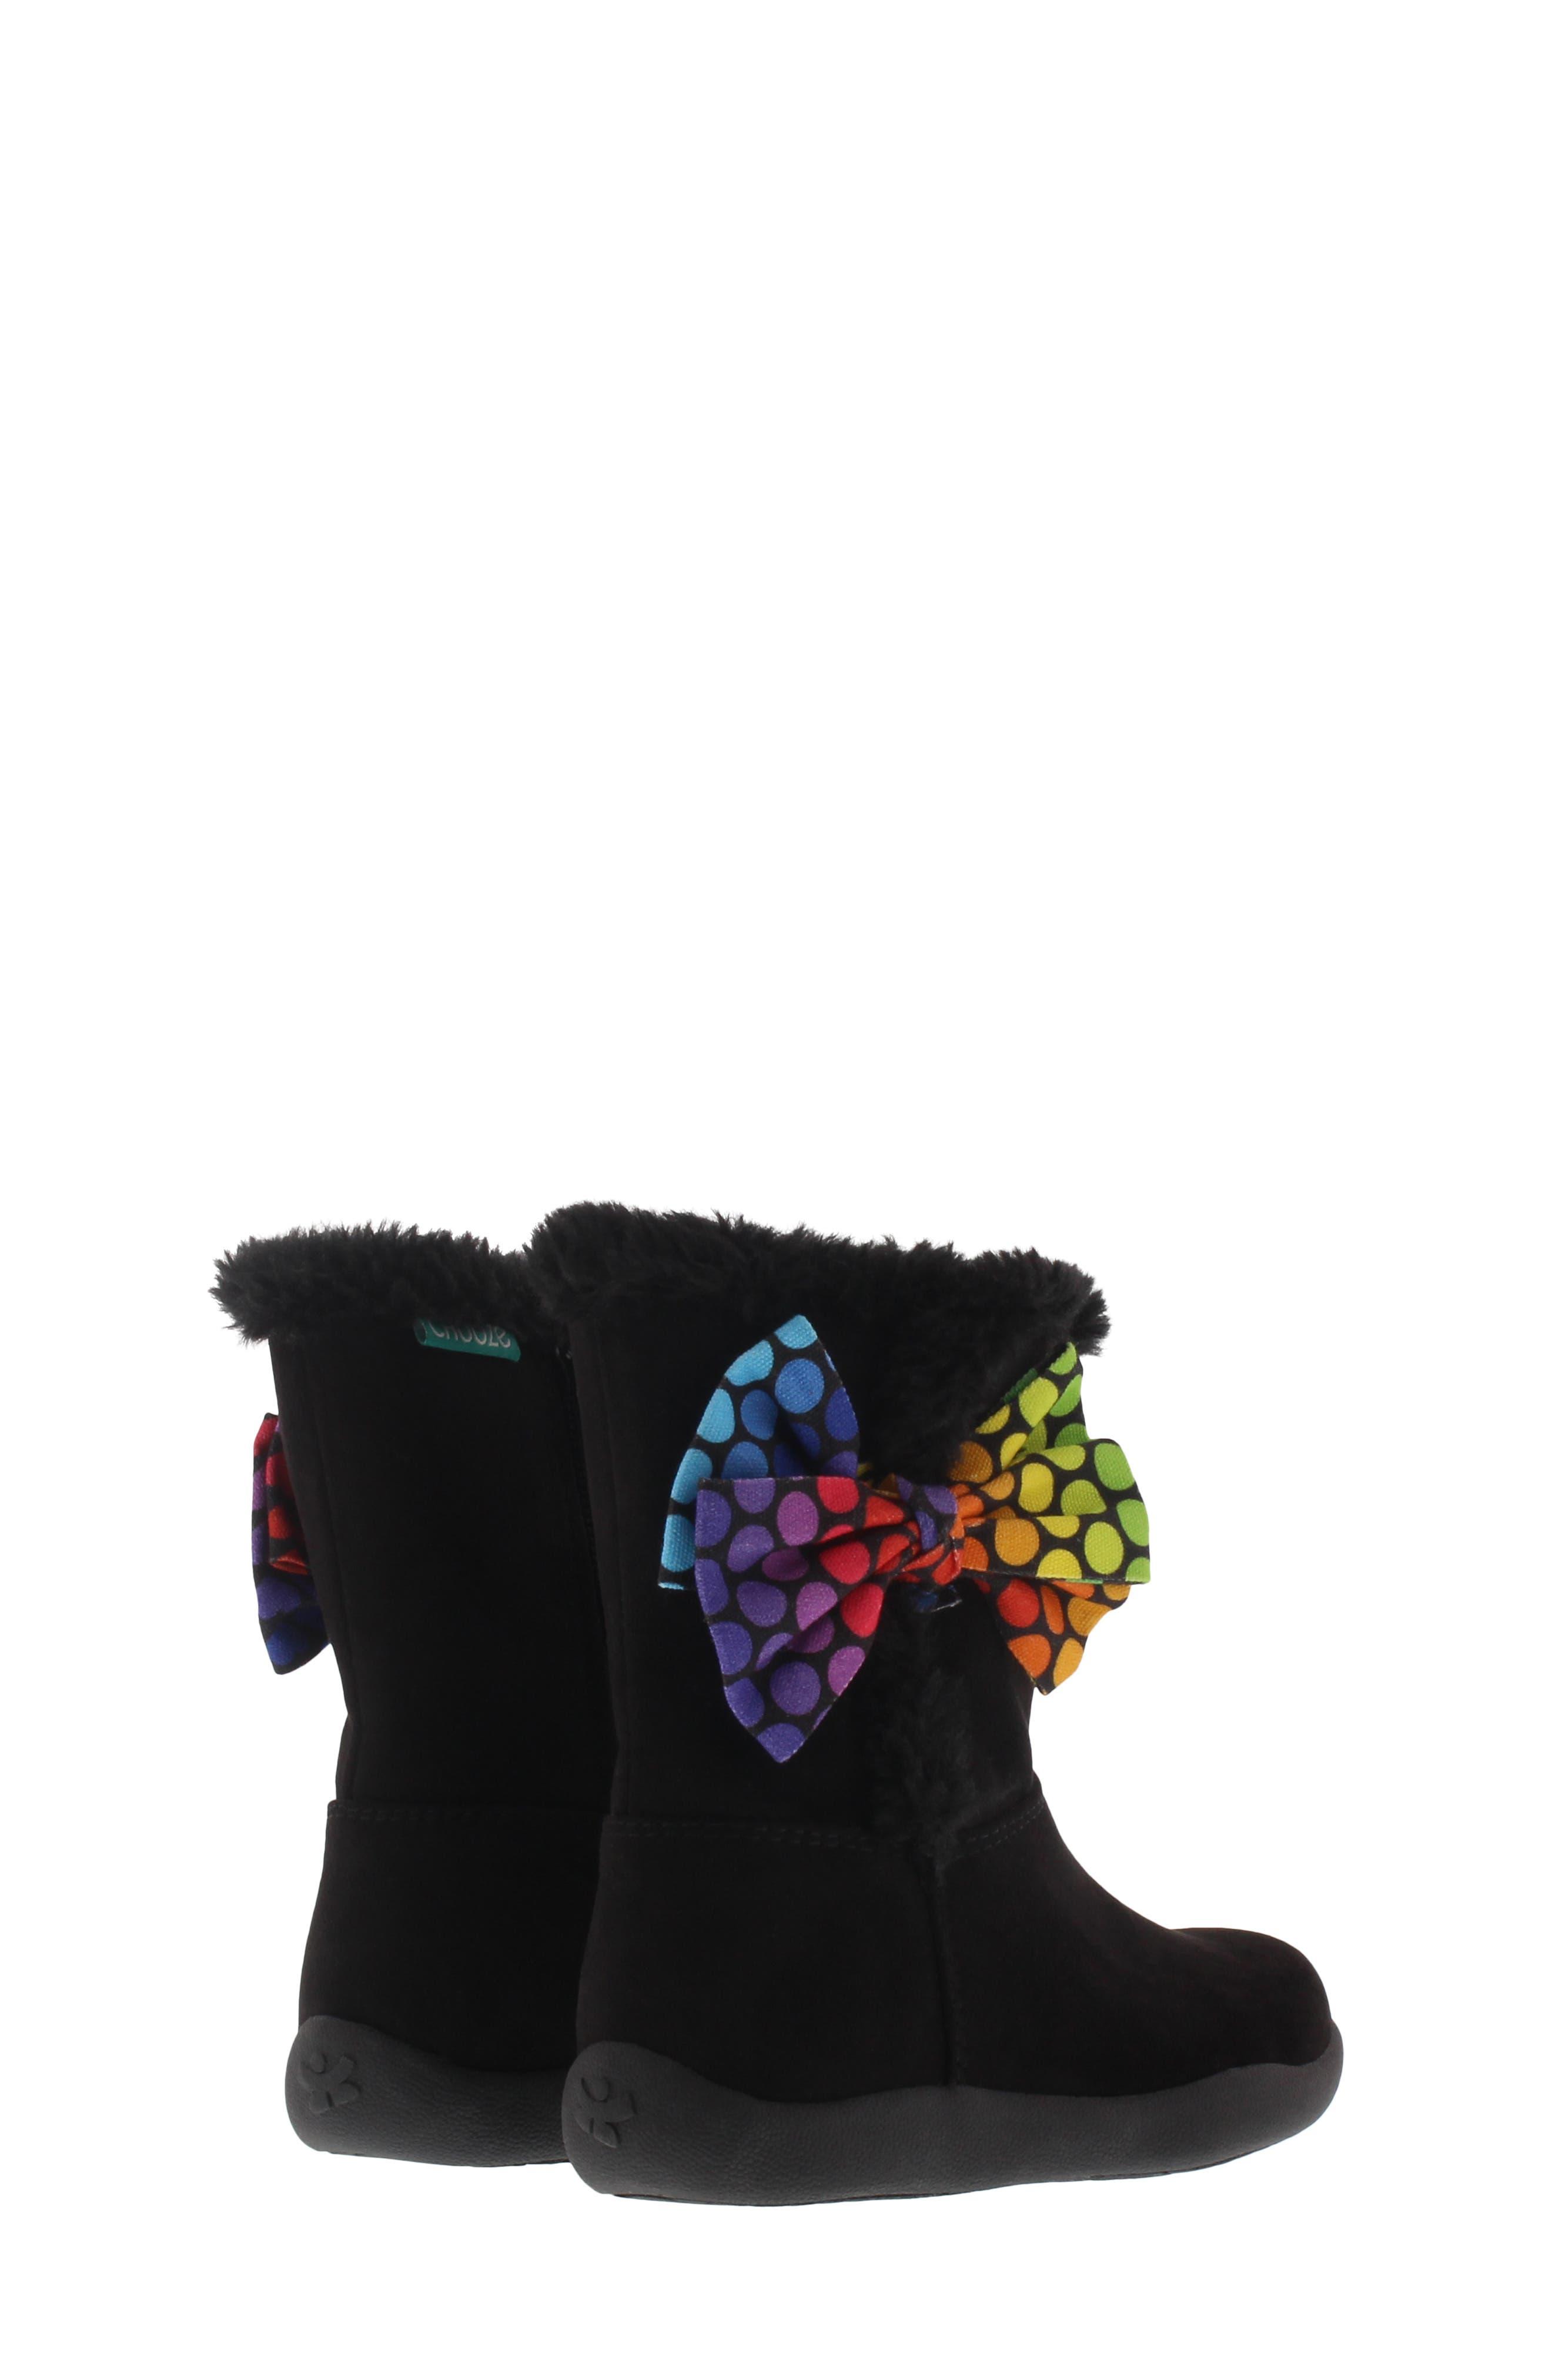 CHOOZE, Wish Faux Fur Lined Boot, Alternate thumbnail 2, color, BLACK